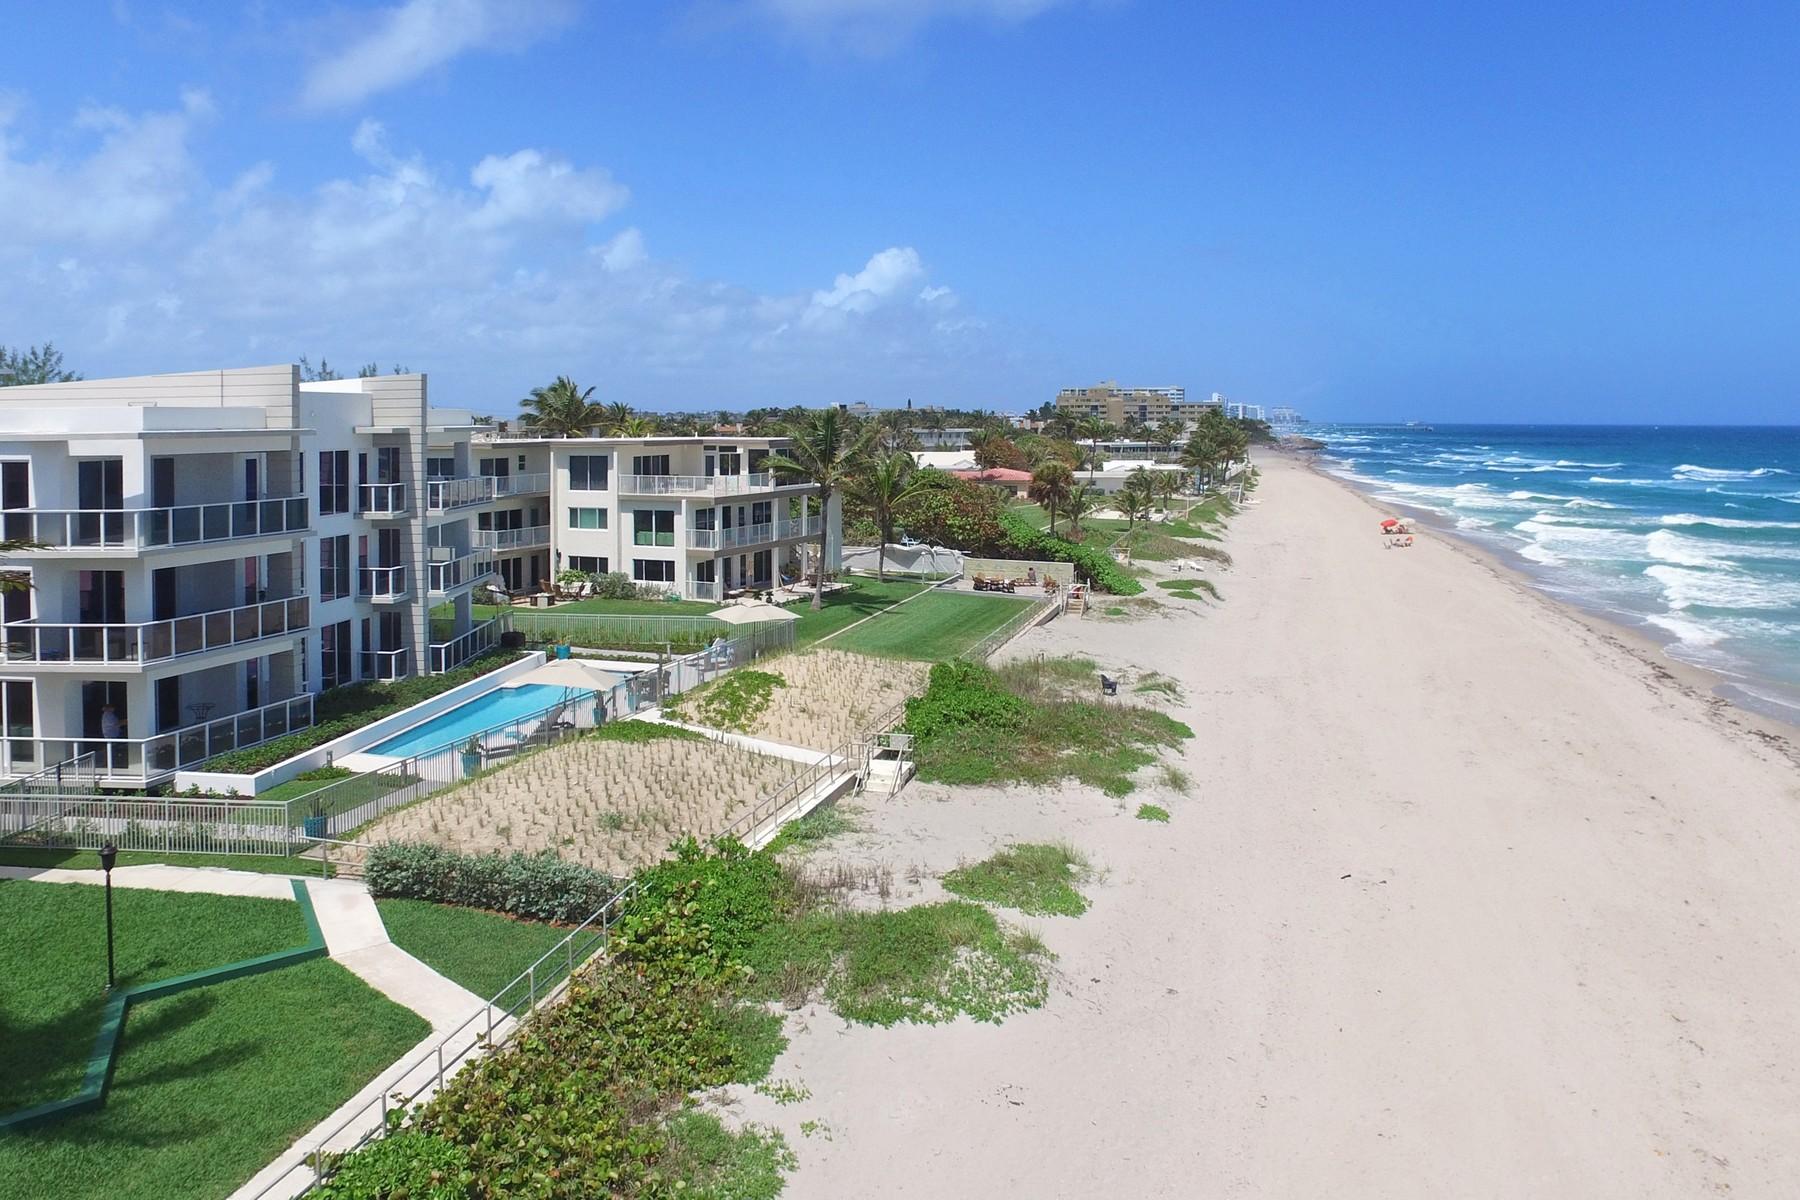 Condomínio para Venda às 1200 Hillsboro Mile , 1303, Hillsboro Beach, FL 33 1200 Hillsboro Mile 1303 Hillsboro Beach, Florida, 33062 Estados Unidos